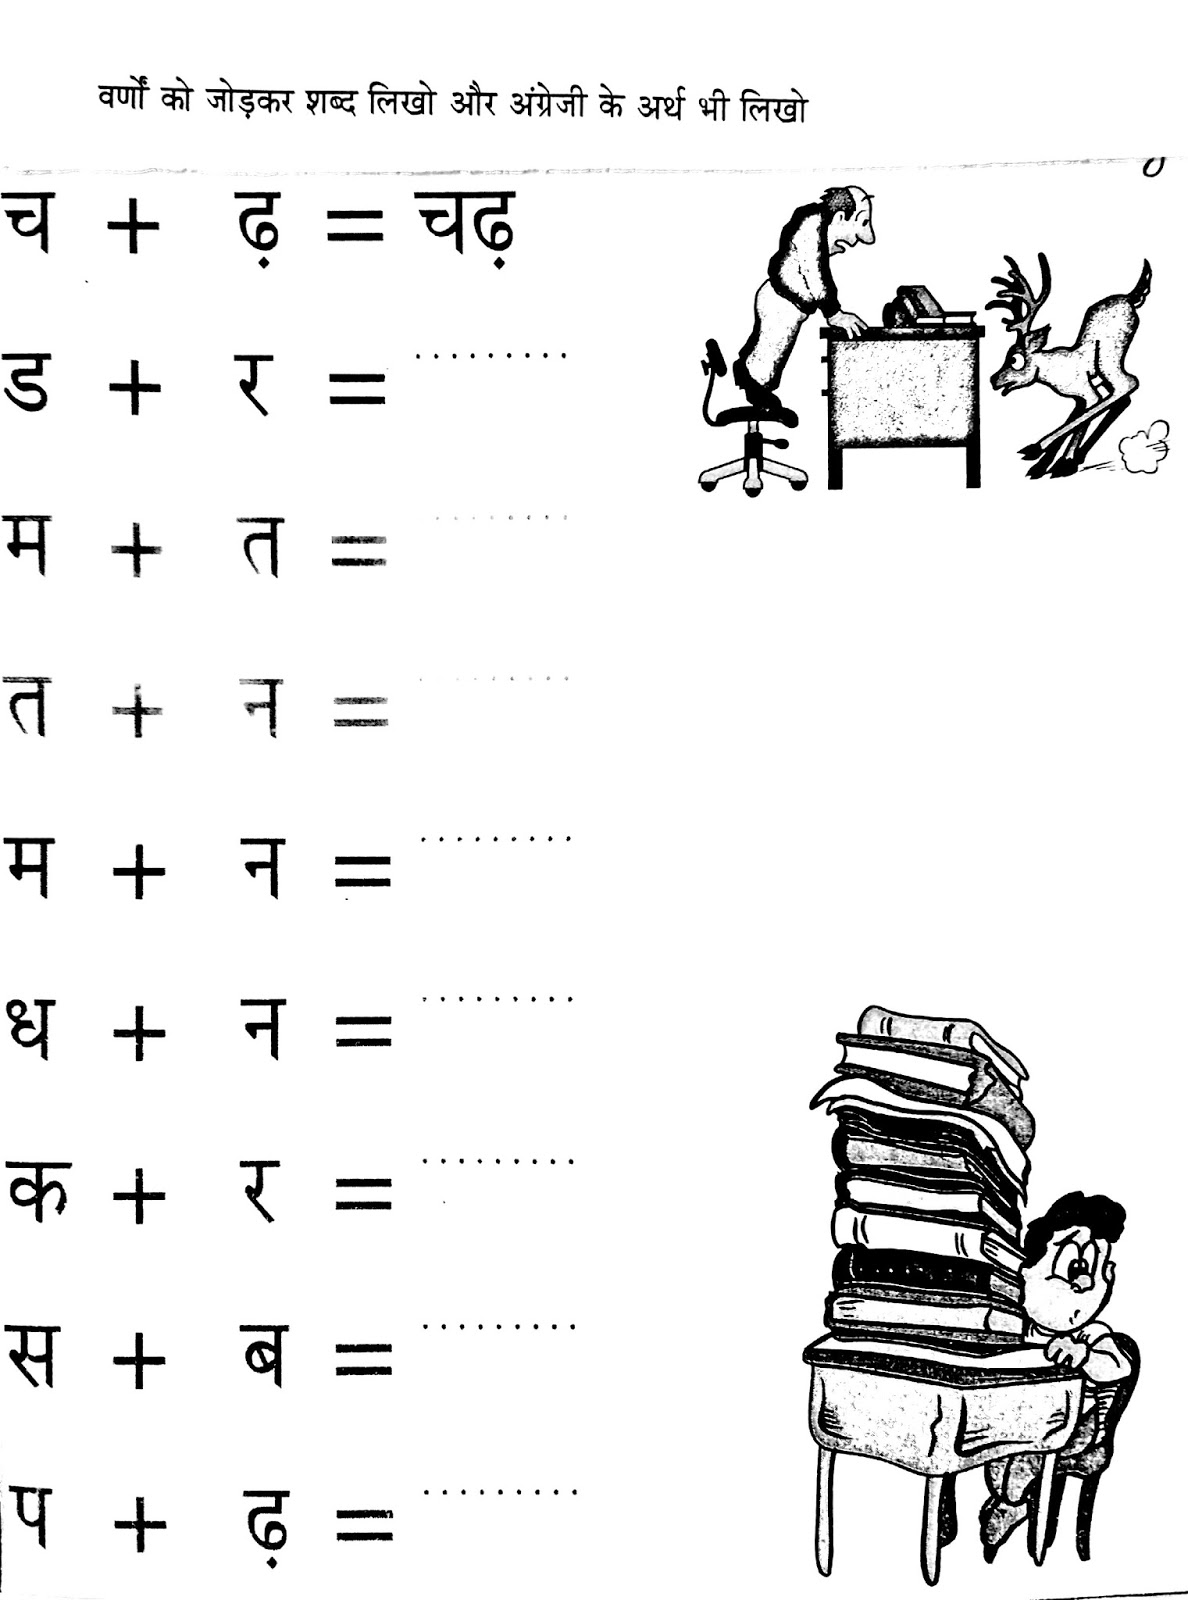 Printable Hindi worksheets to practice aa ki matra, ideal